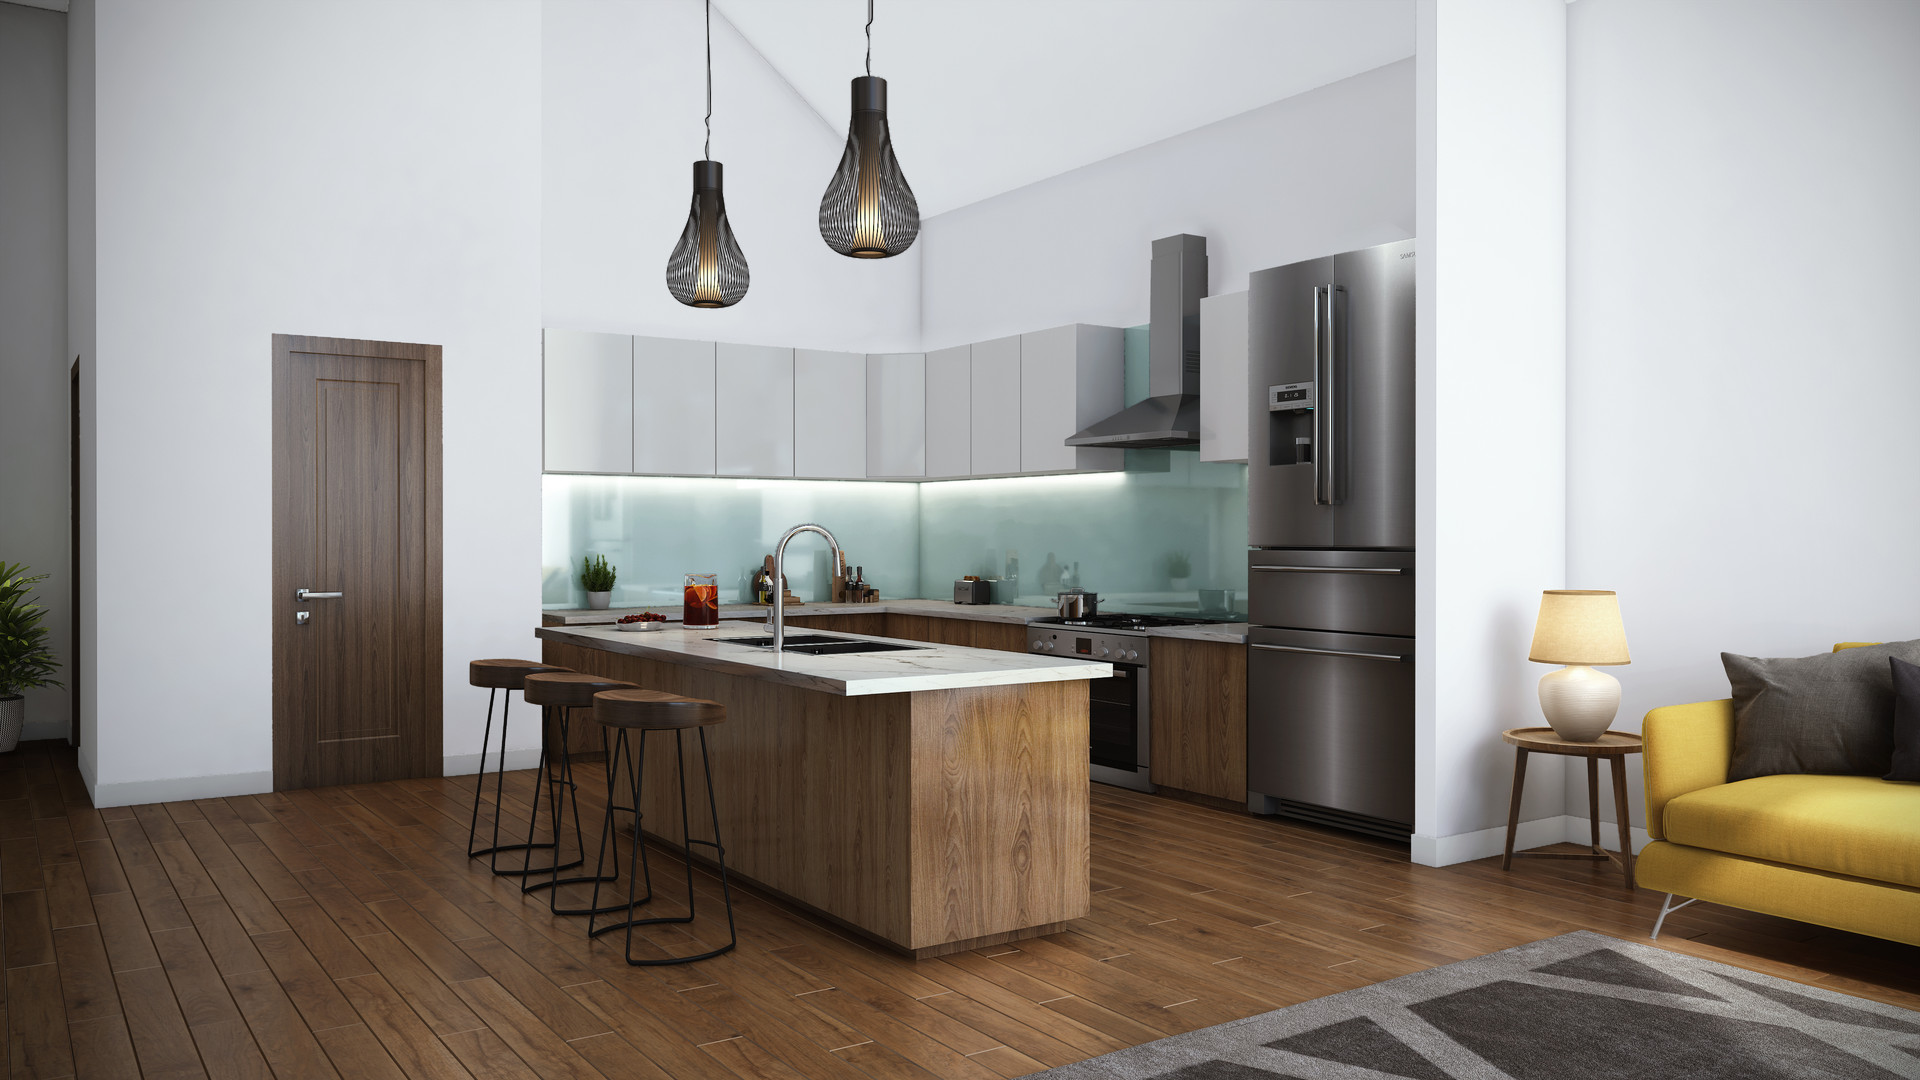 pelican-shoreslarge12-kitchen-high-res.j